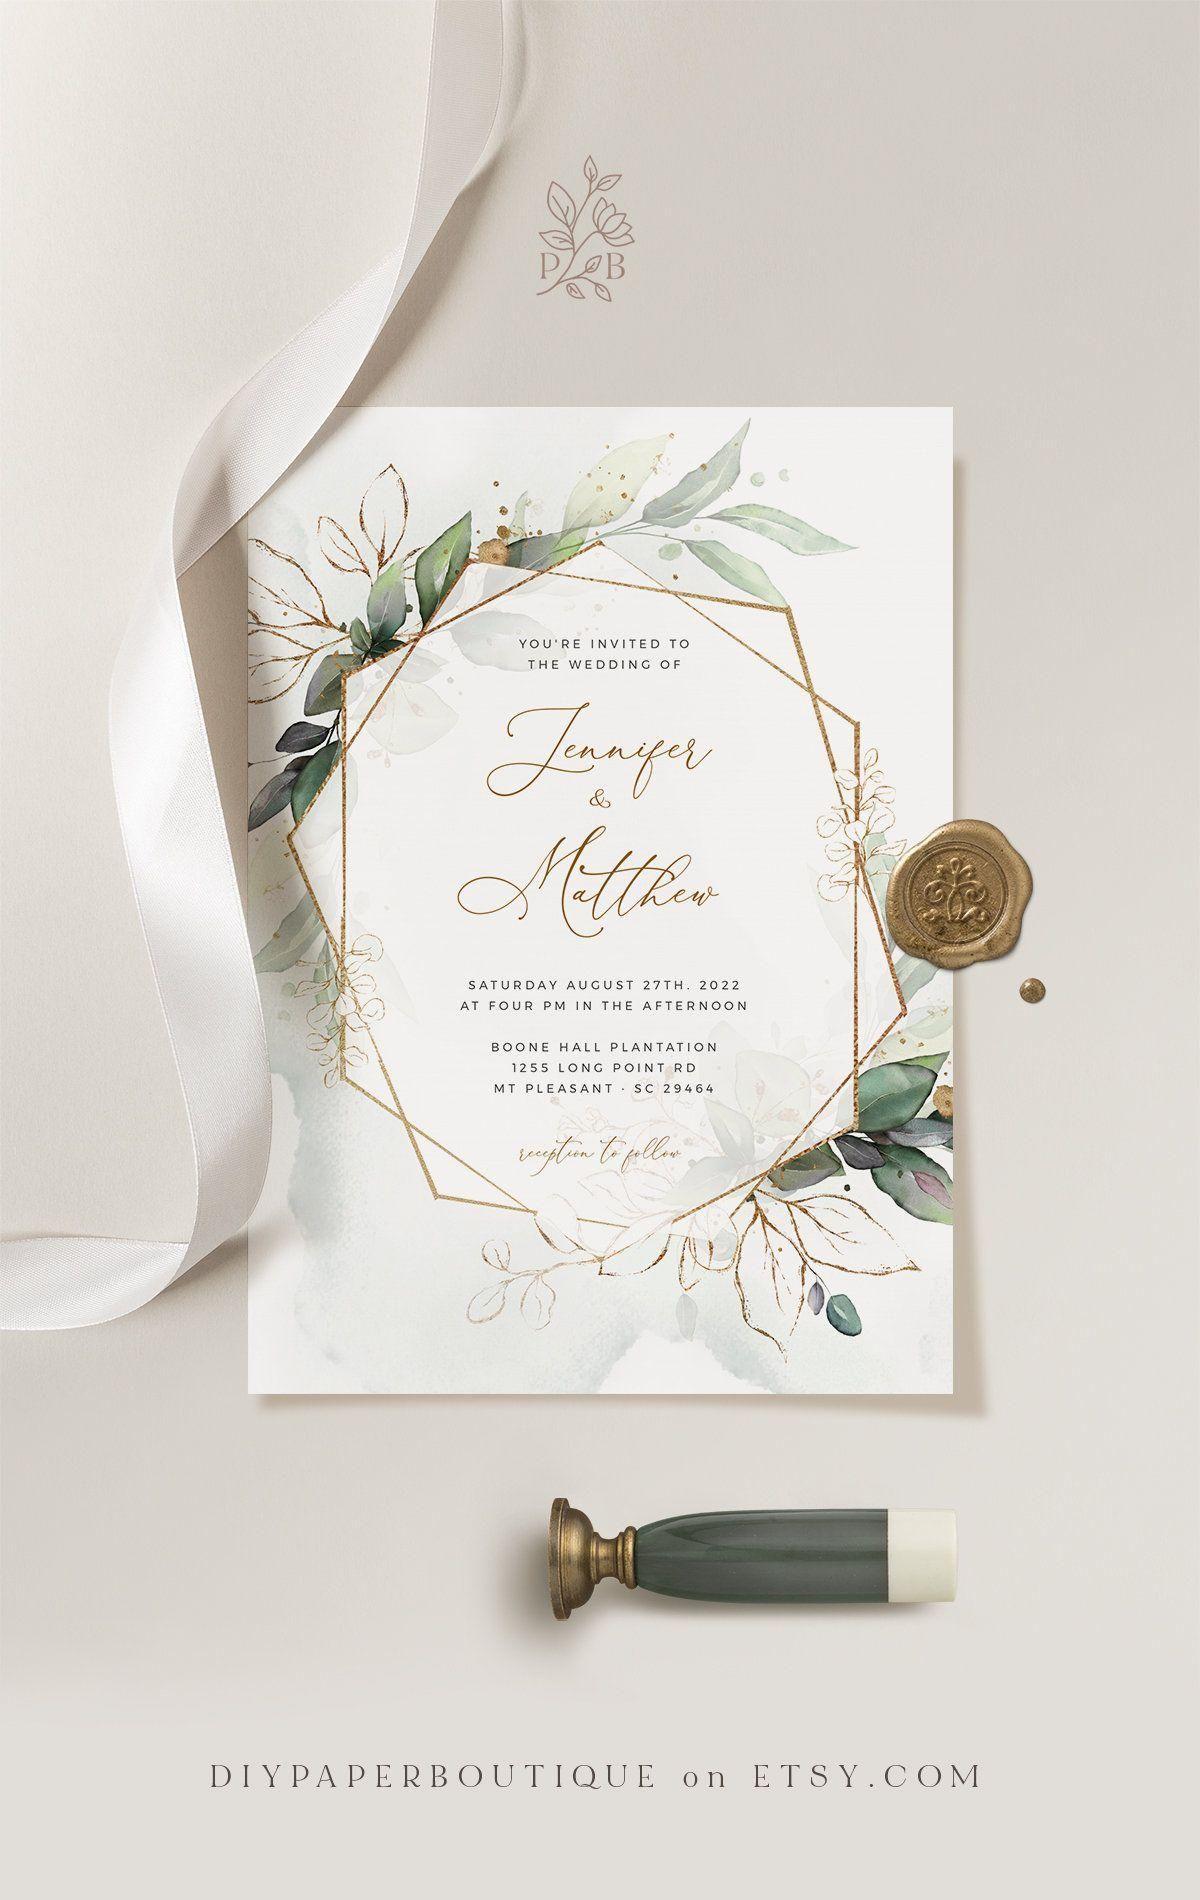 White Roses Greenery Wedding Invitation Template White Roses Eucalyptus Invitation Bundle for Wedding White Roses Greenery Wedding NEVE